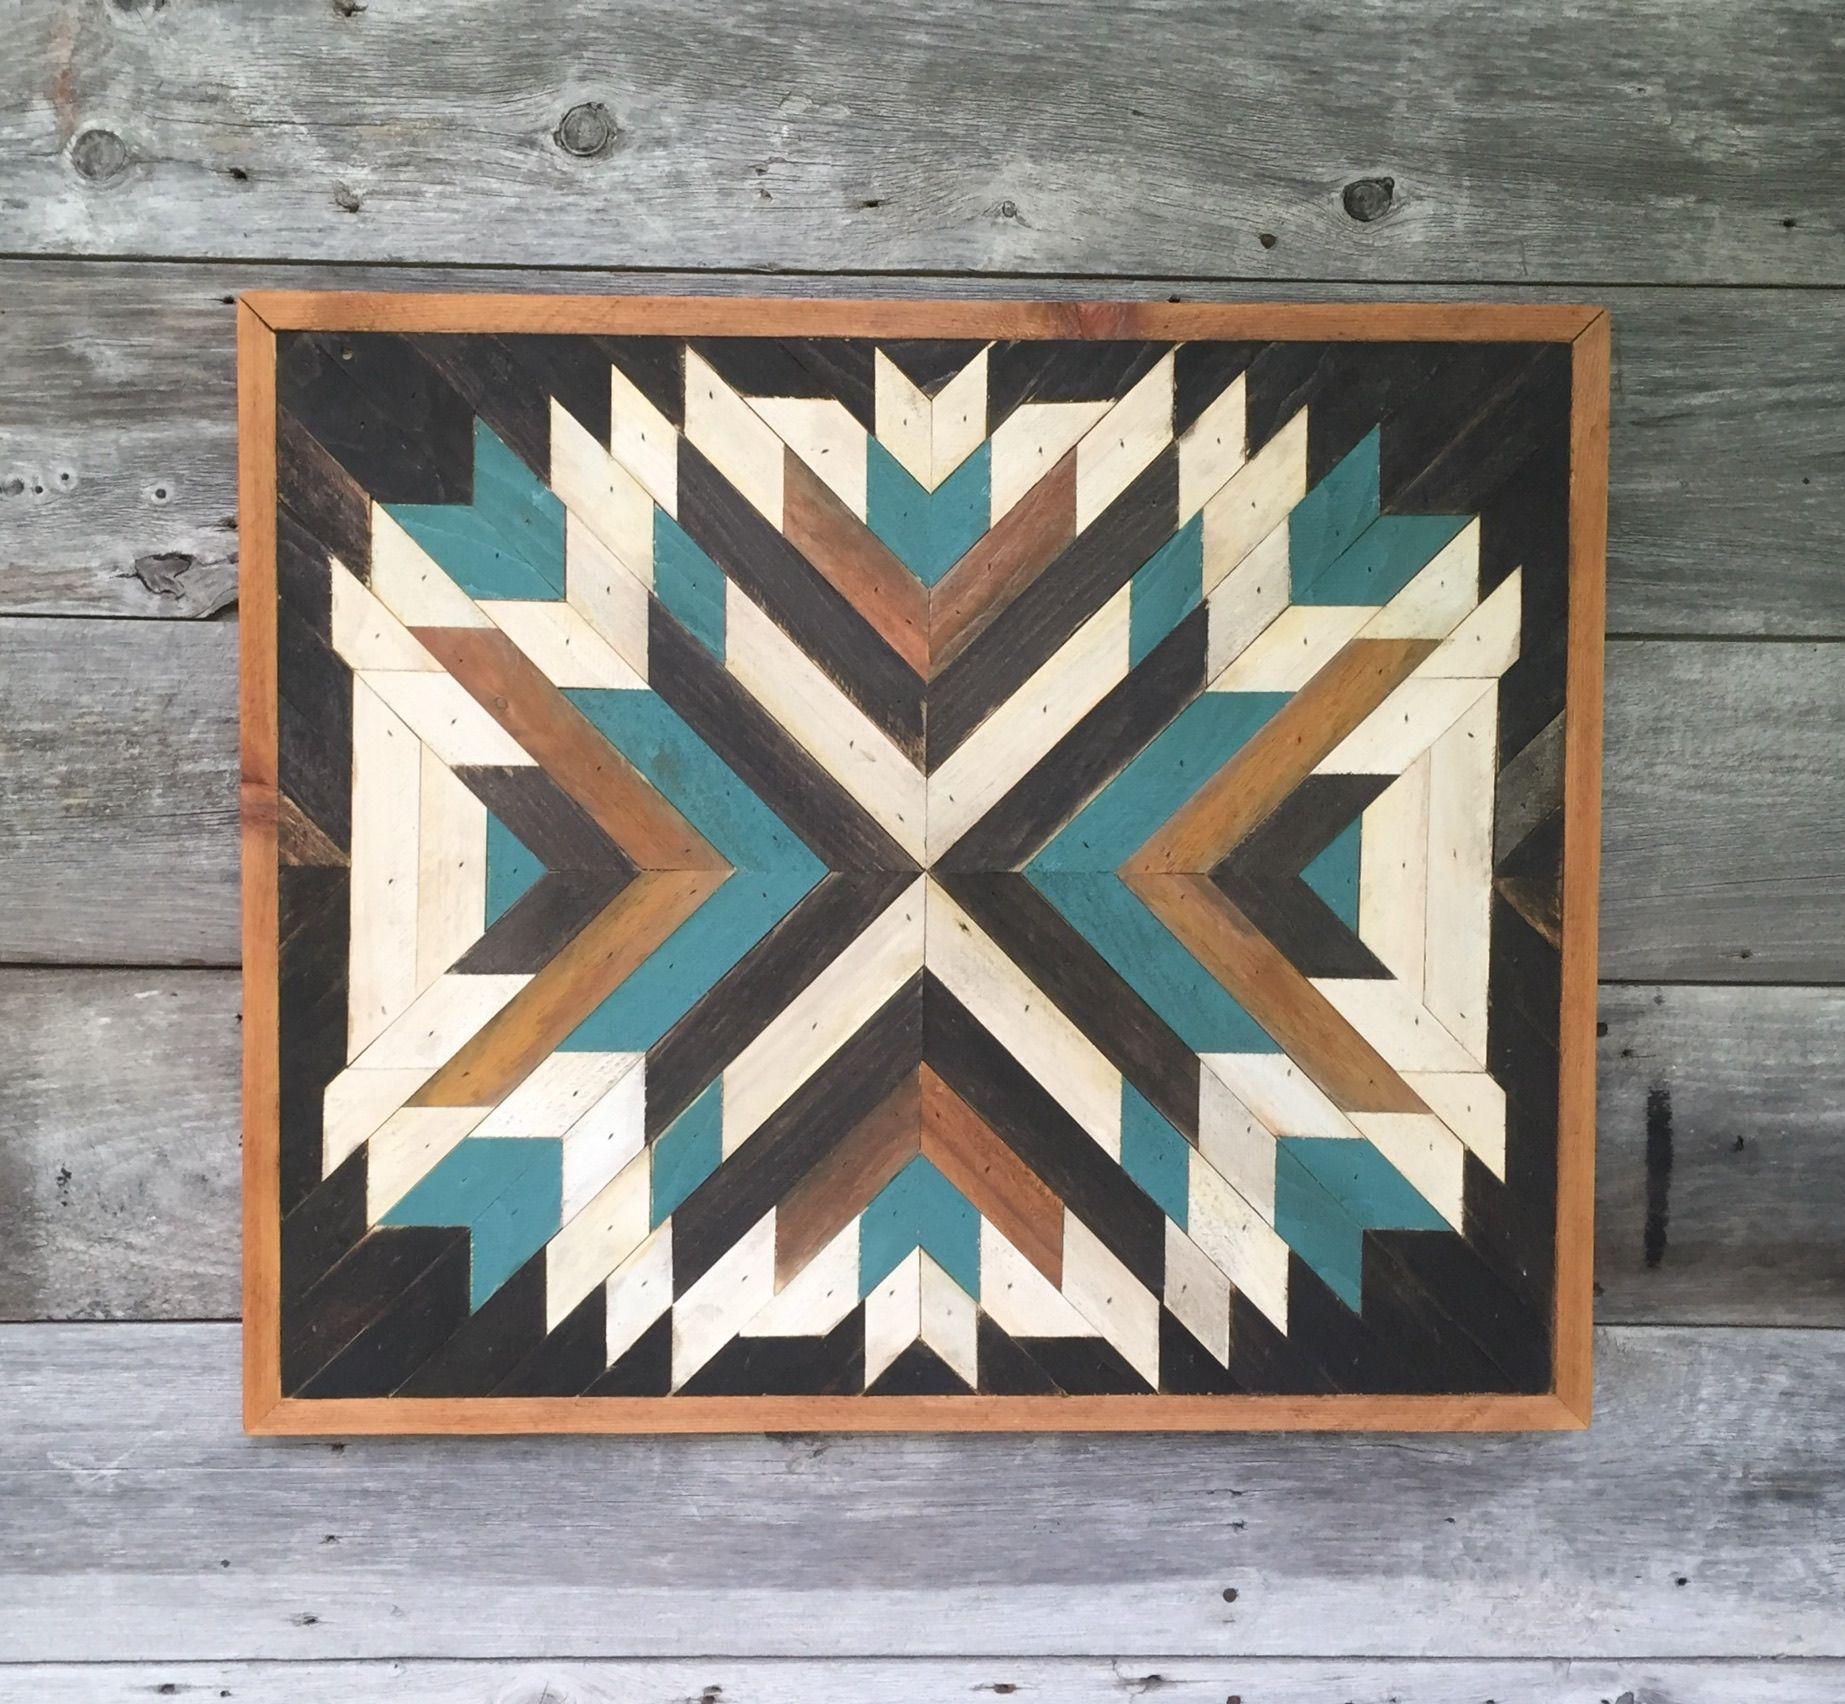 Wood Wall Art Decor, Reclaimed Wood Wall Art, Wooden Wall